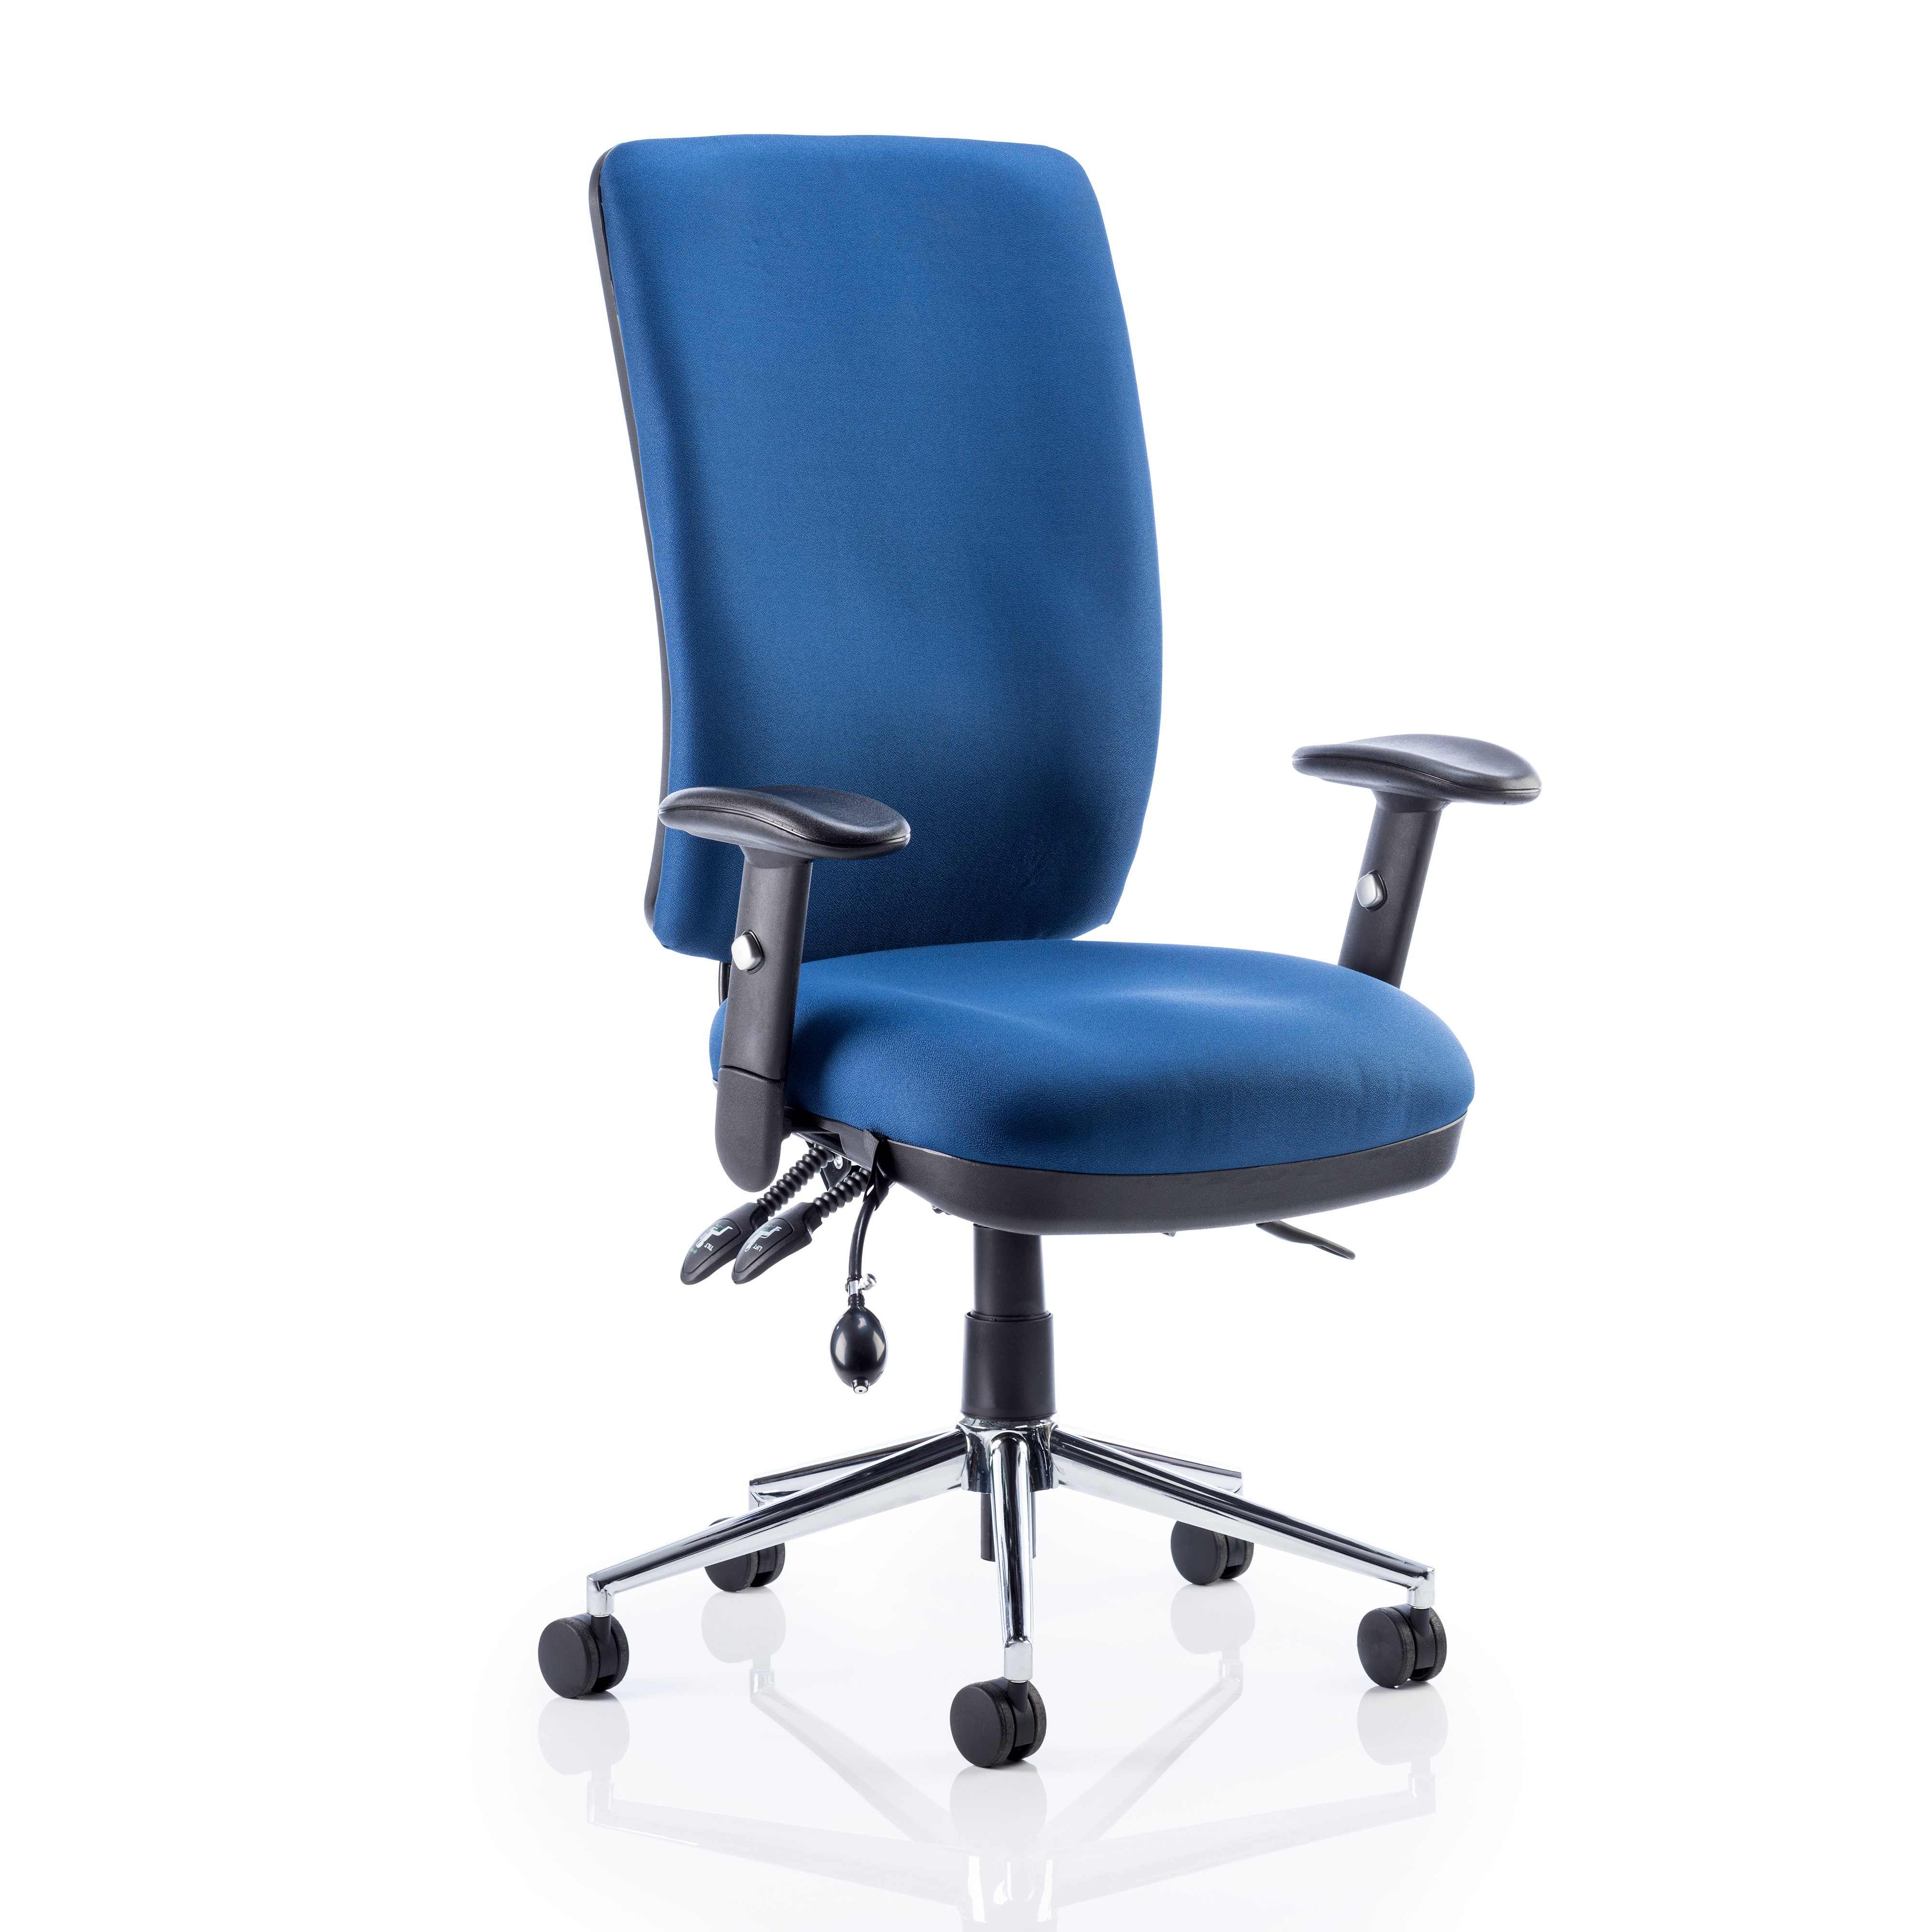 Sonix Support Chiro High Back Chair Blue 510x480-540x500-600mm Ref OP000007